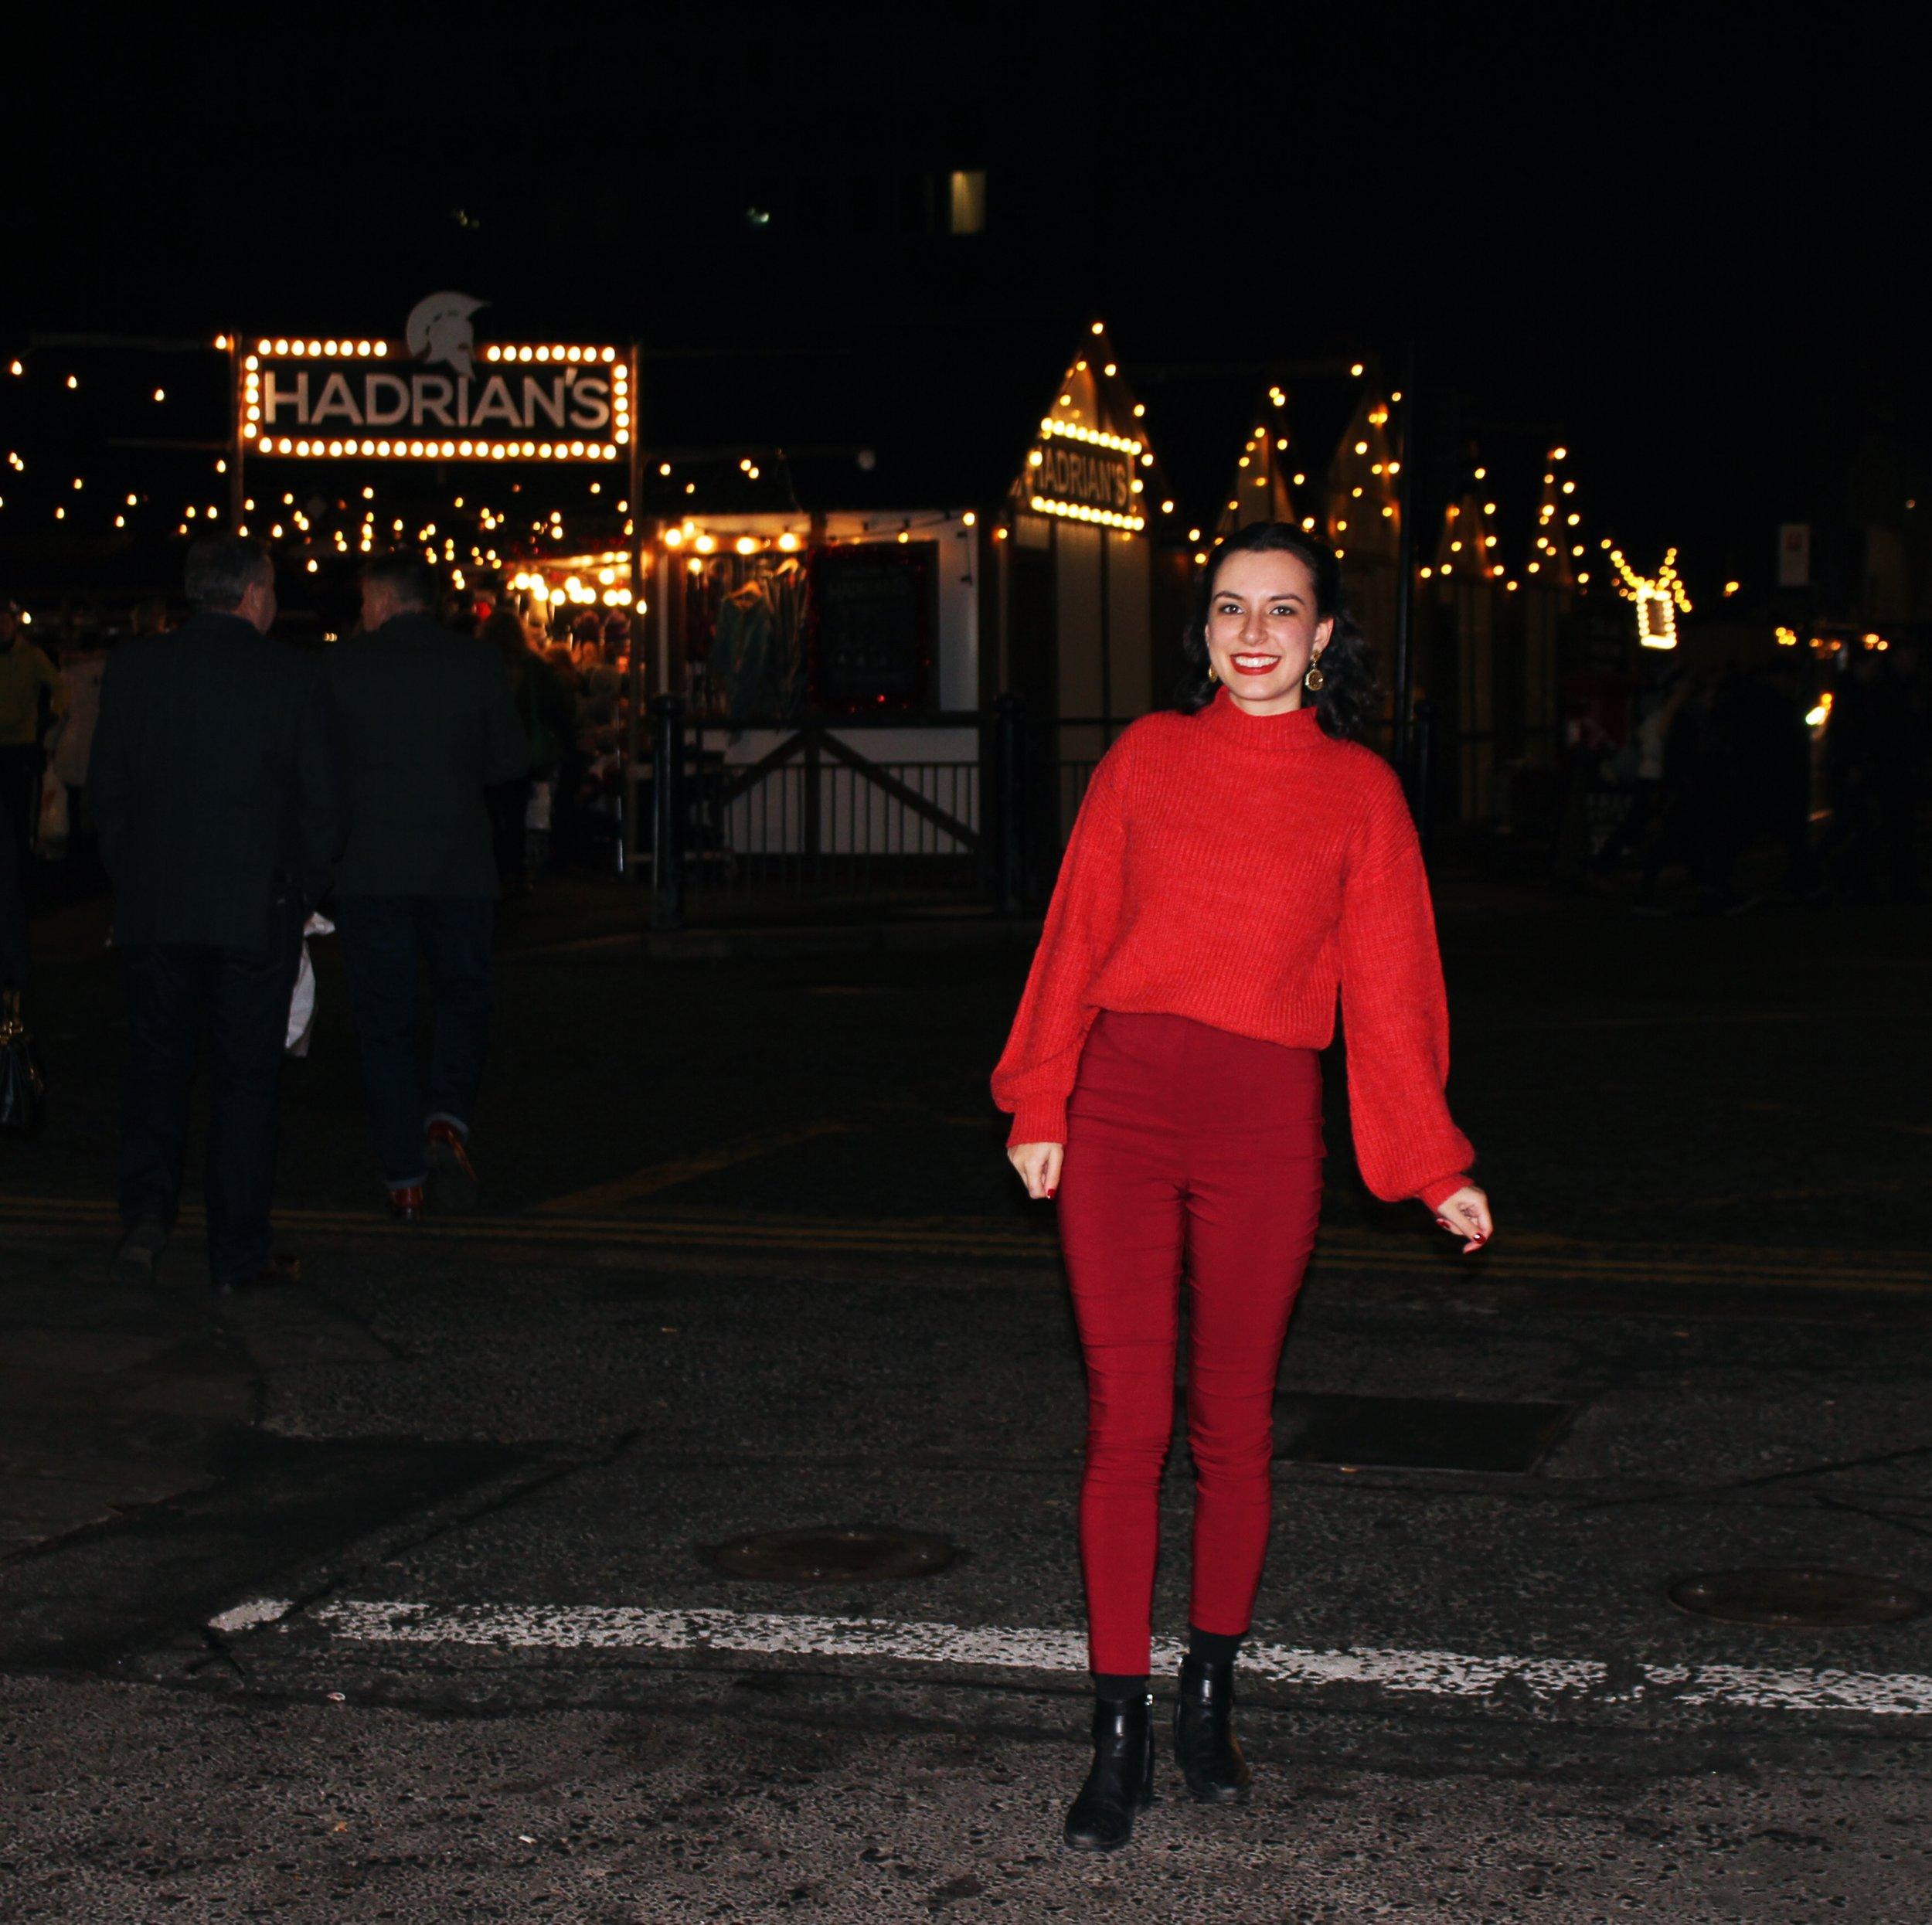 Newcastle Christmas Market Fashion Union Zalando Jumper Asos Red Trousers Rhoyally Chic UK Fashion Blogger